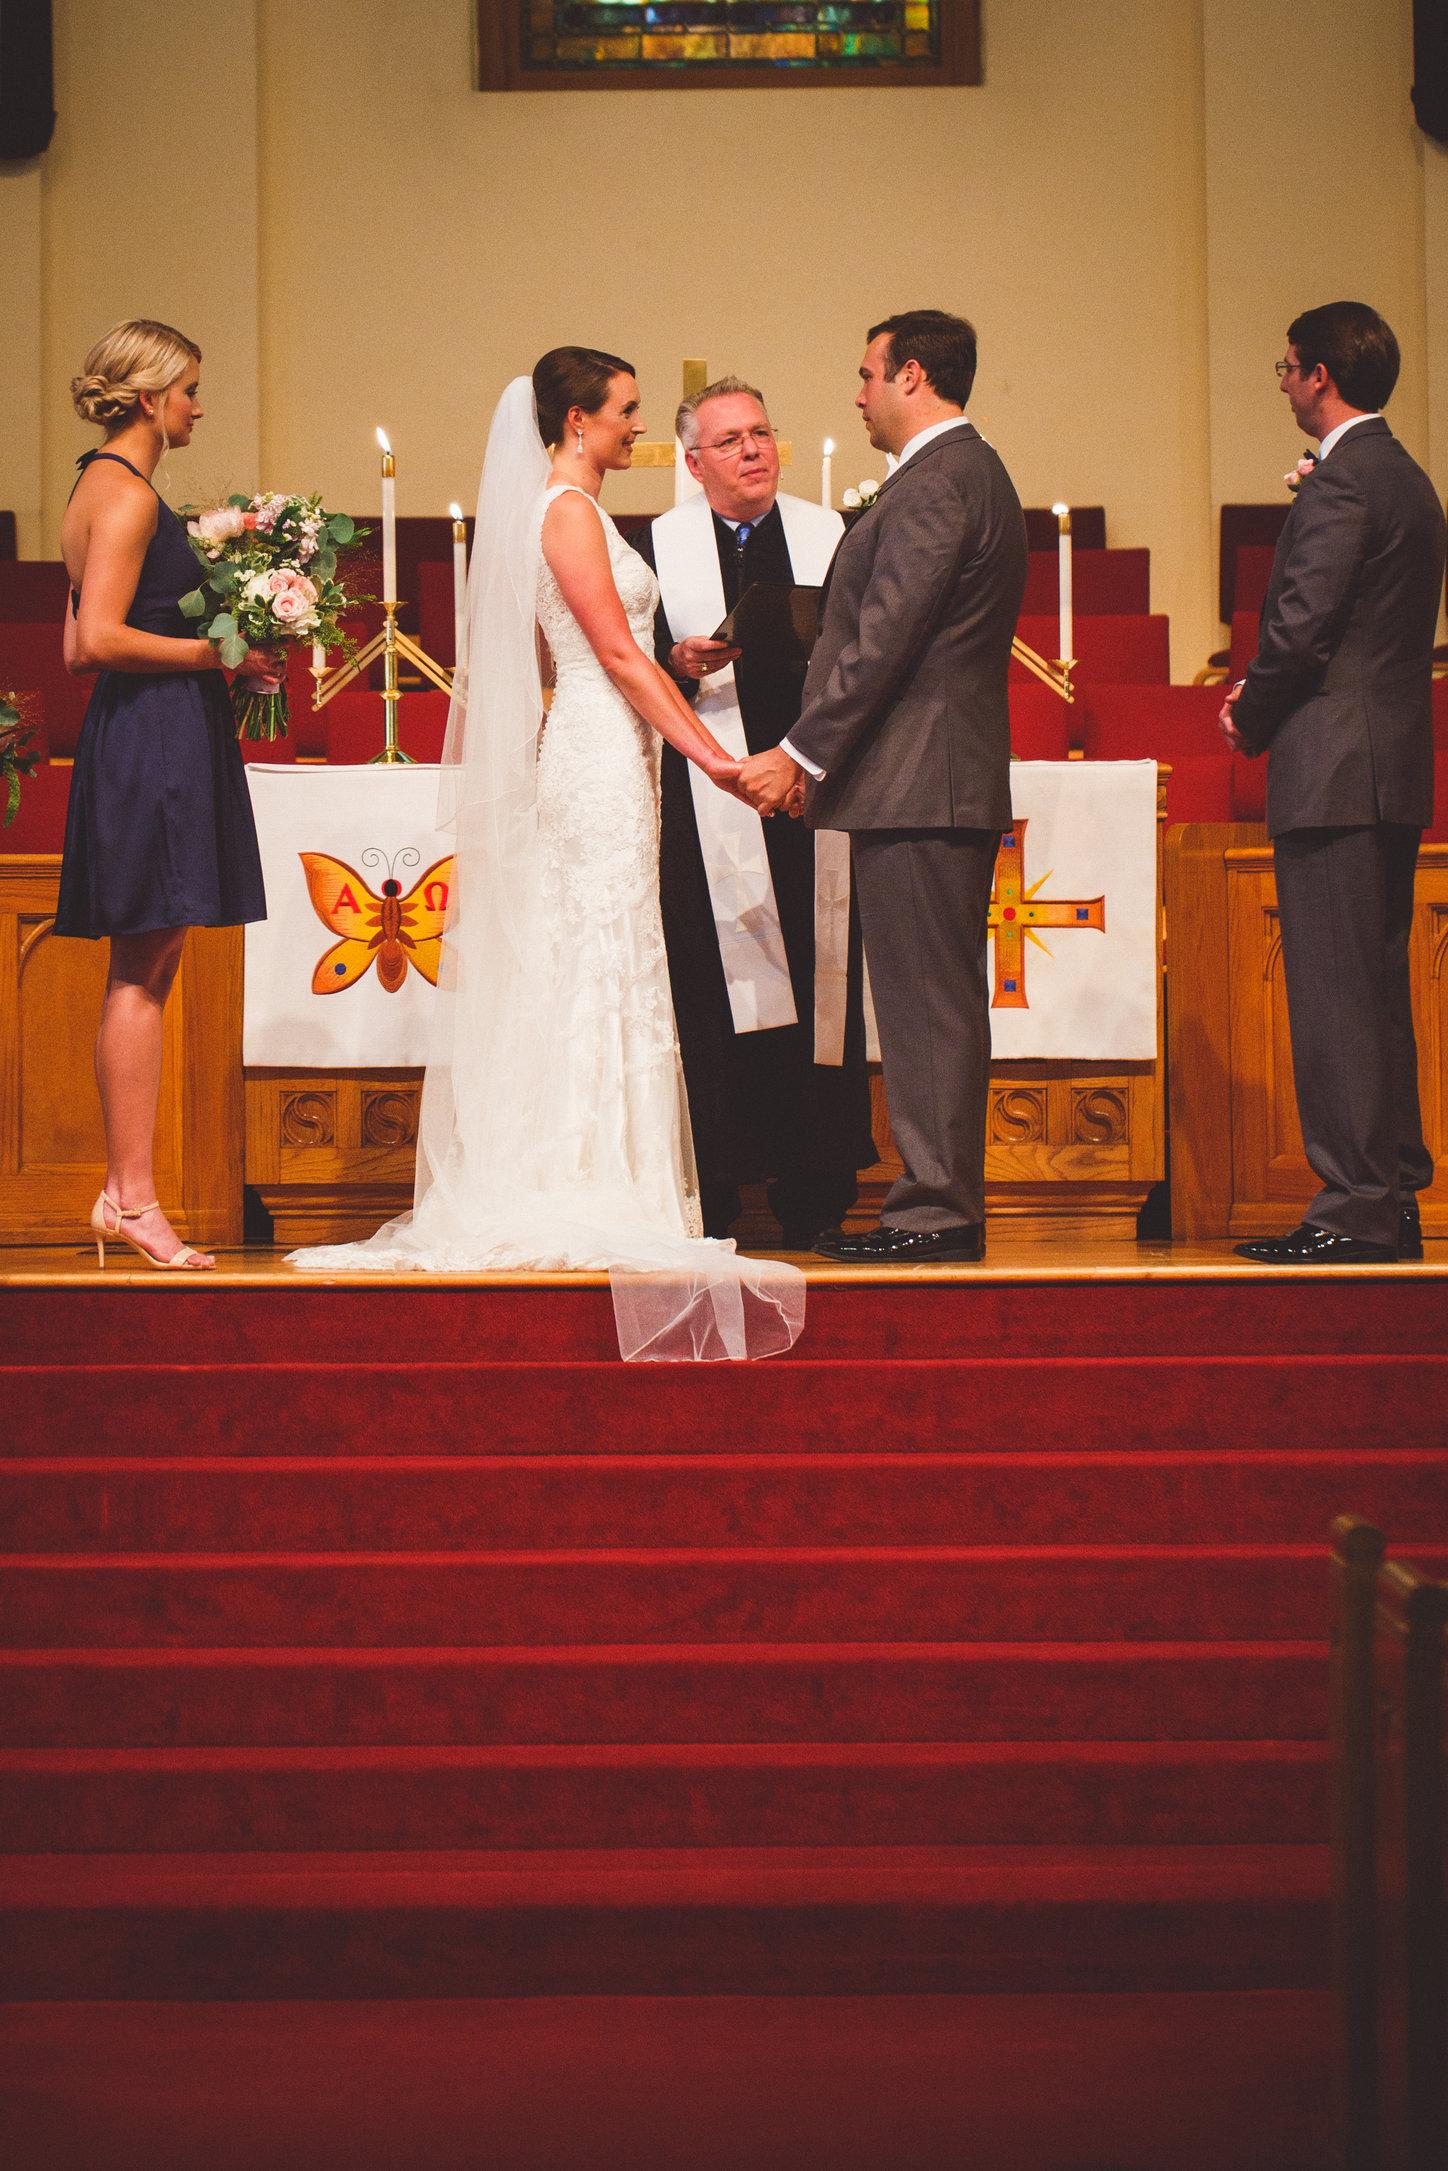 SandC-wedding-199.jpg